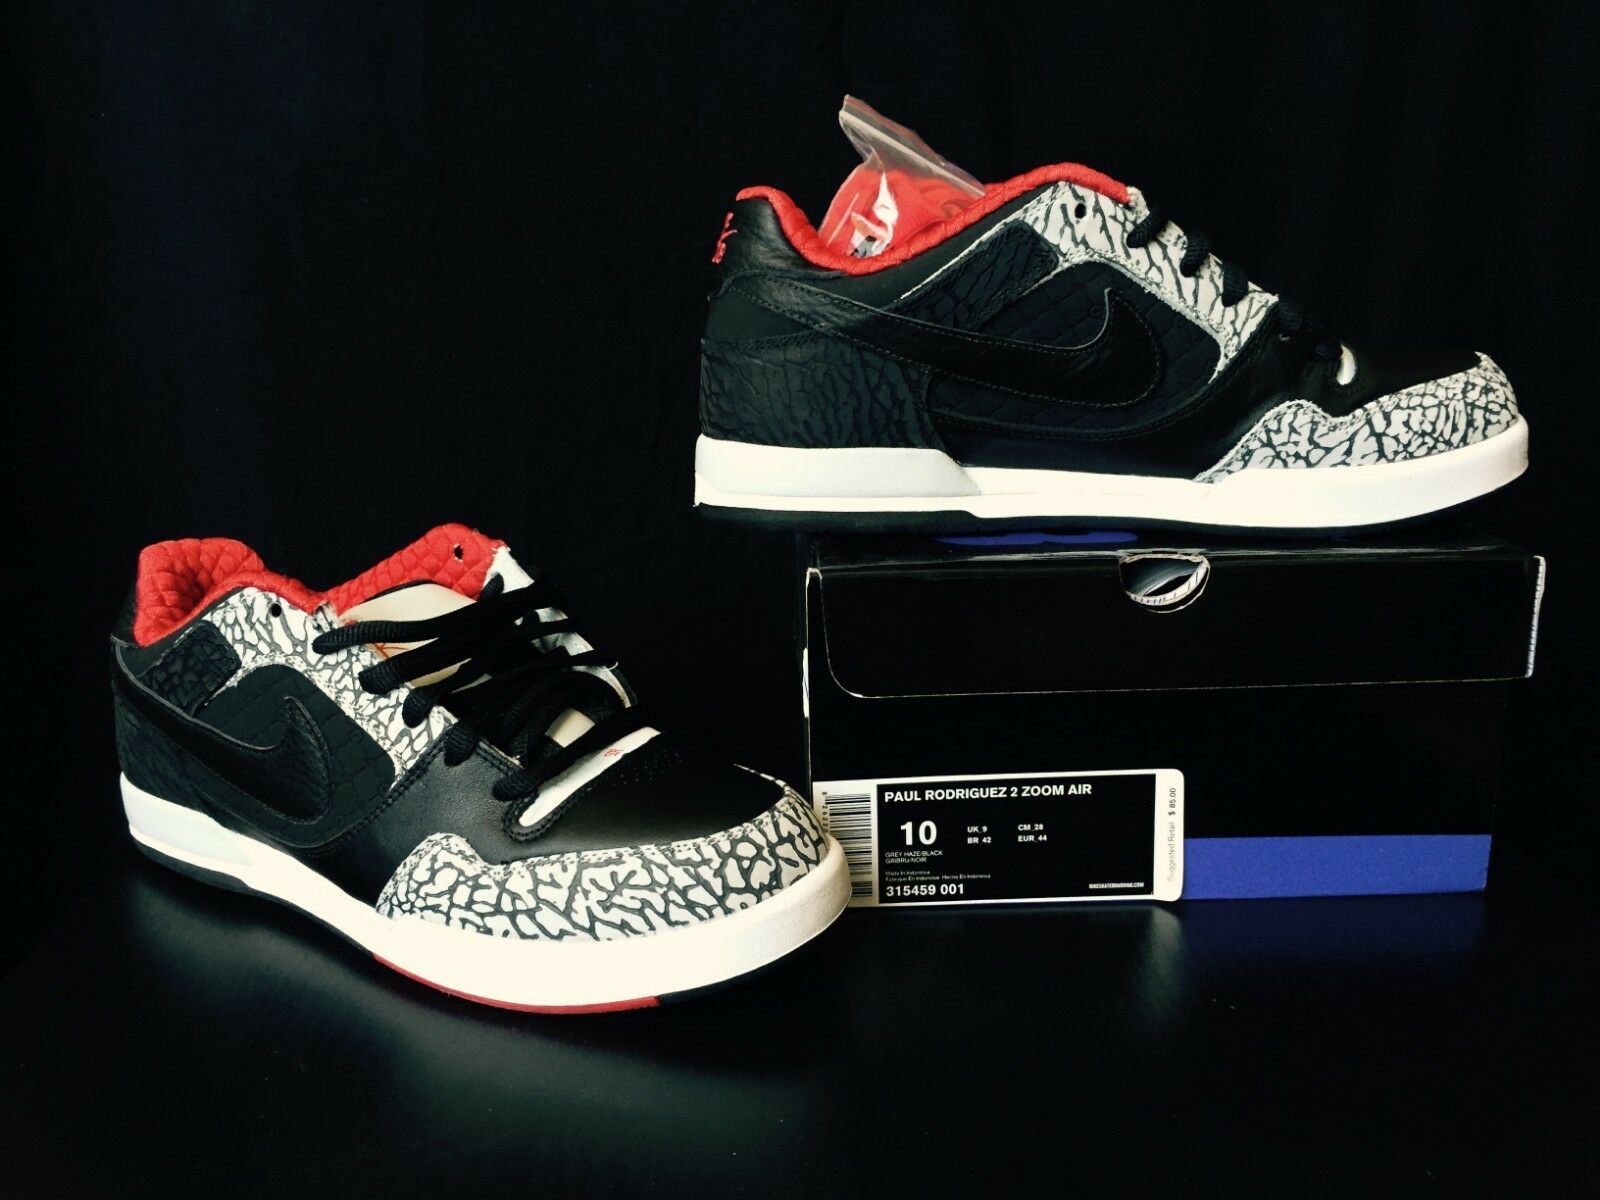 Nike SB Paul Paul Paul Rodriguez 2 Zoom Air PRod Grey Haze Black 2007 NEW IN BOX Size 10 fd95cc